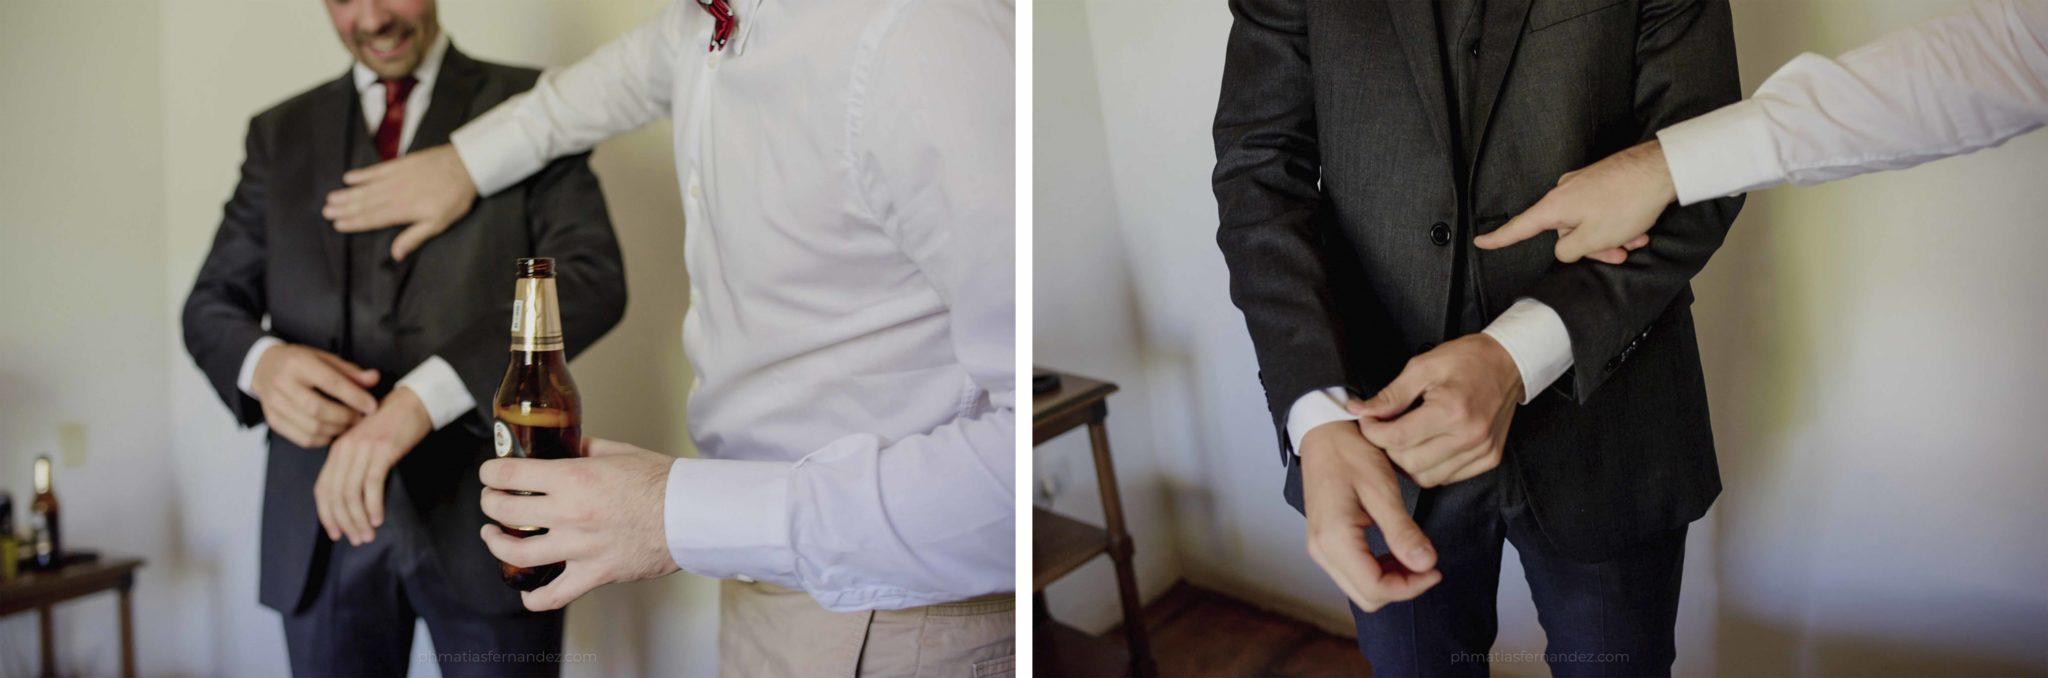 Vir & Tincho - boda en purmamarca - phmatiasfernandez - matias fernandez